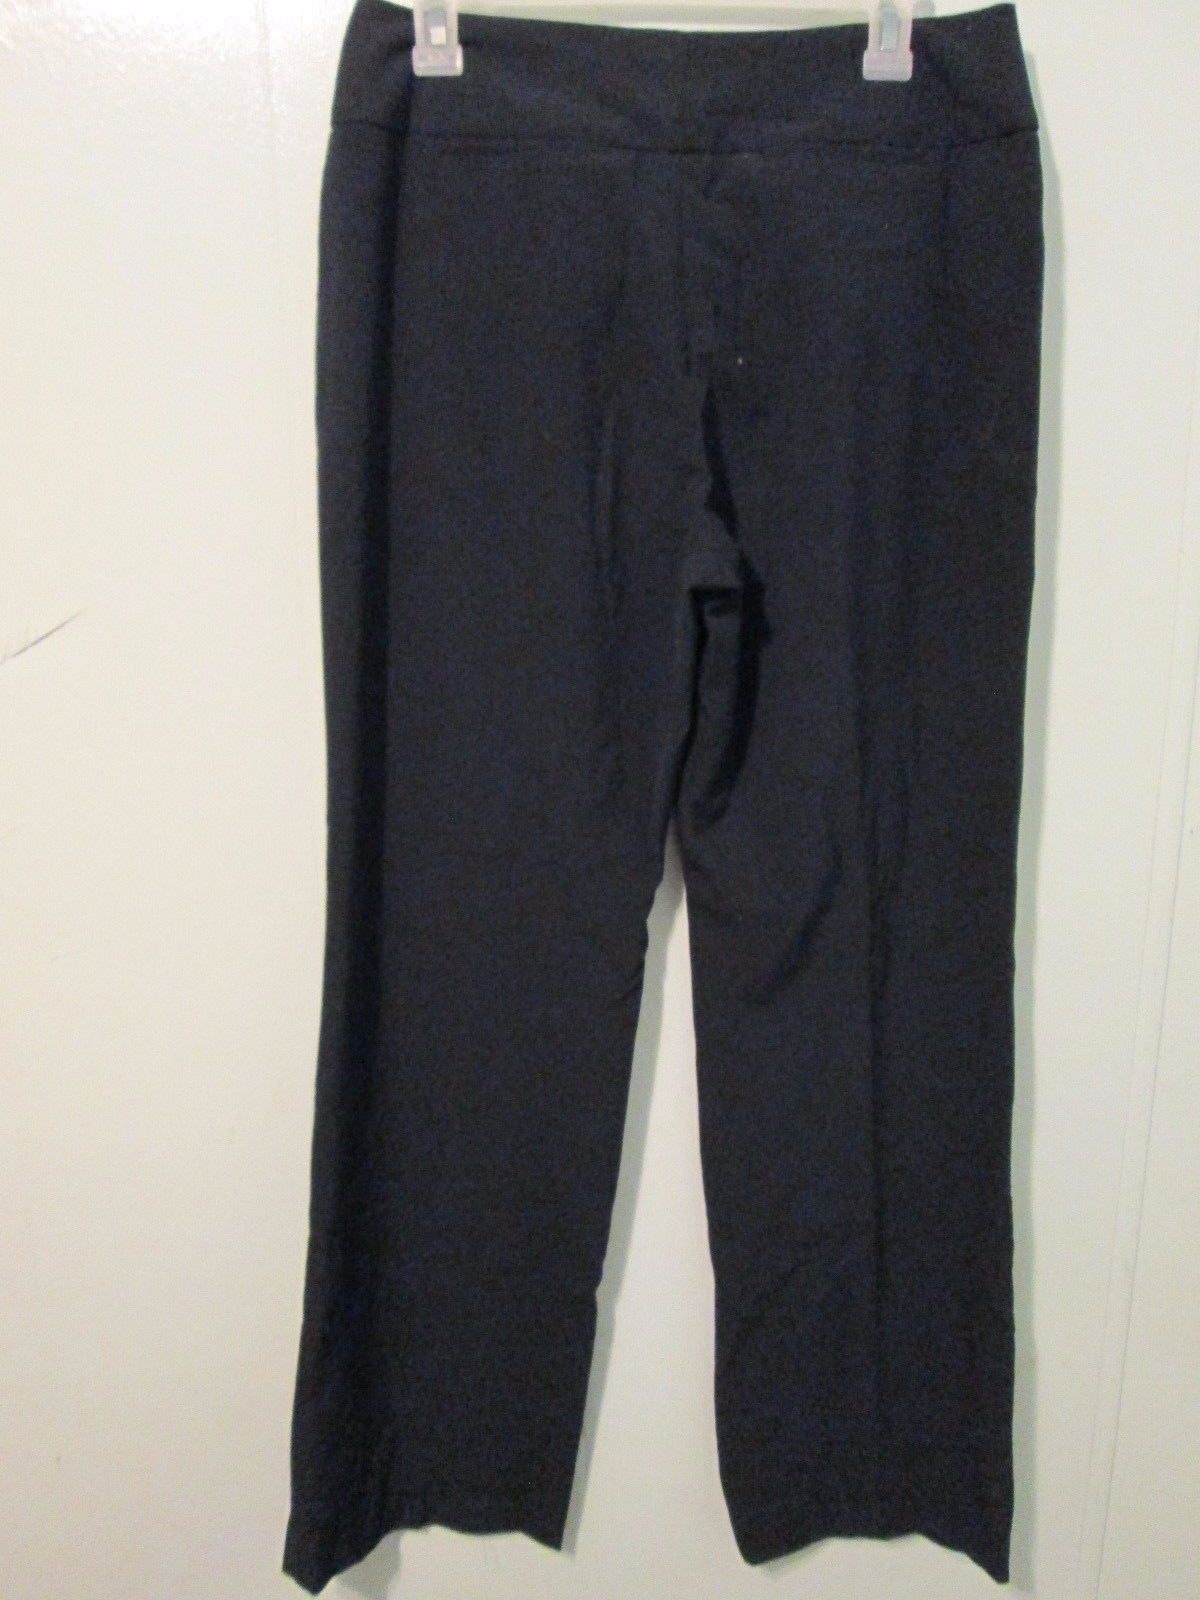 Stylish women's black dress pants Size 6 by Larry Levine  MMARS342